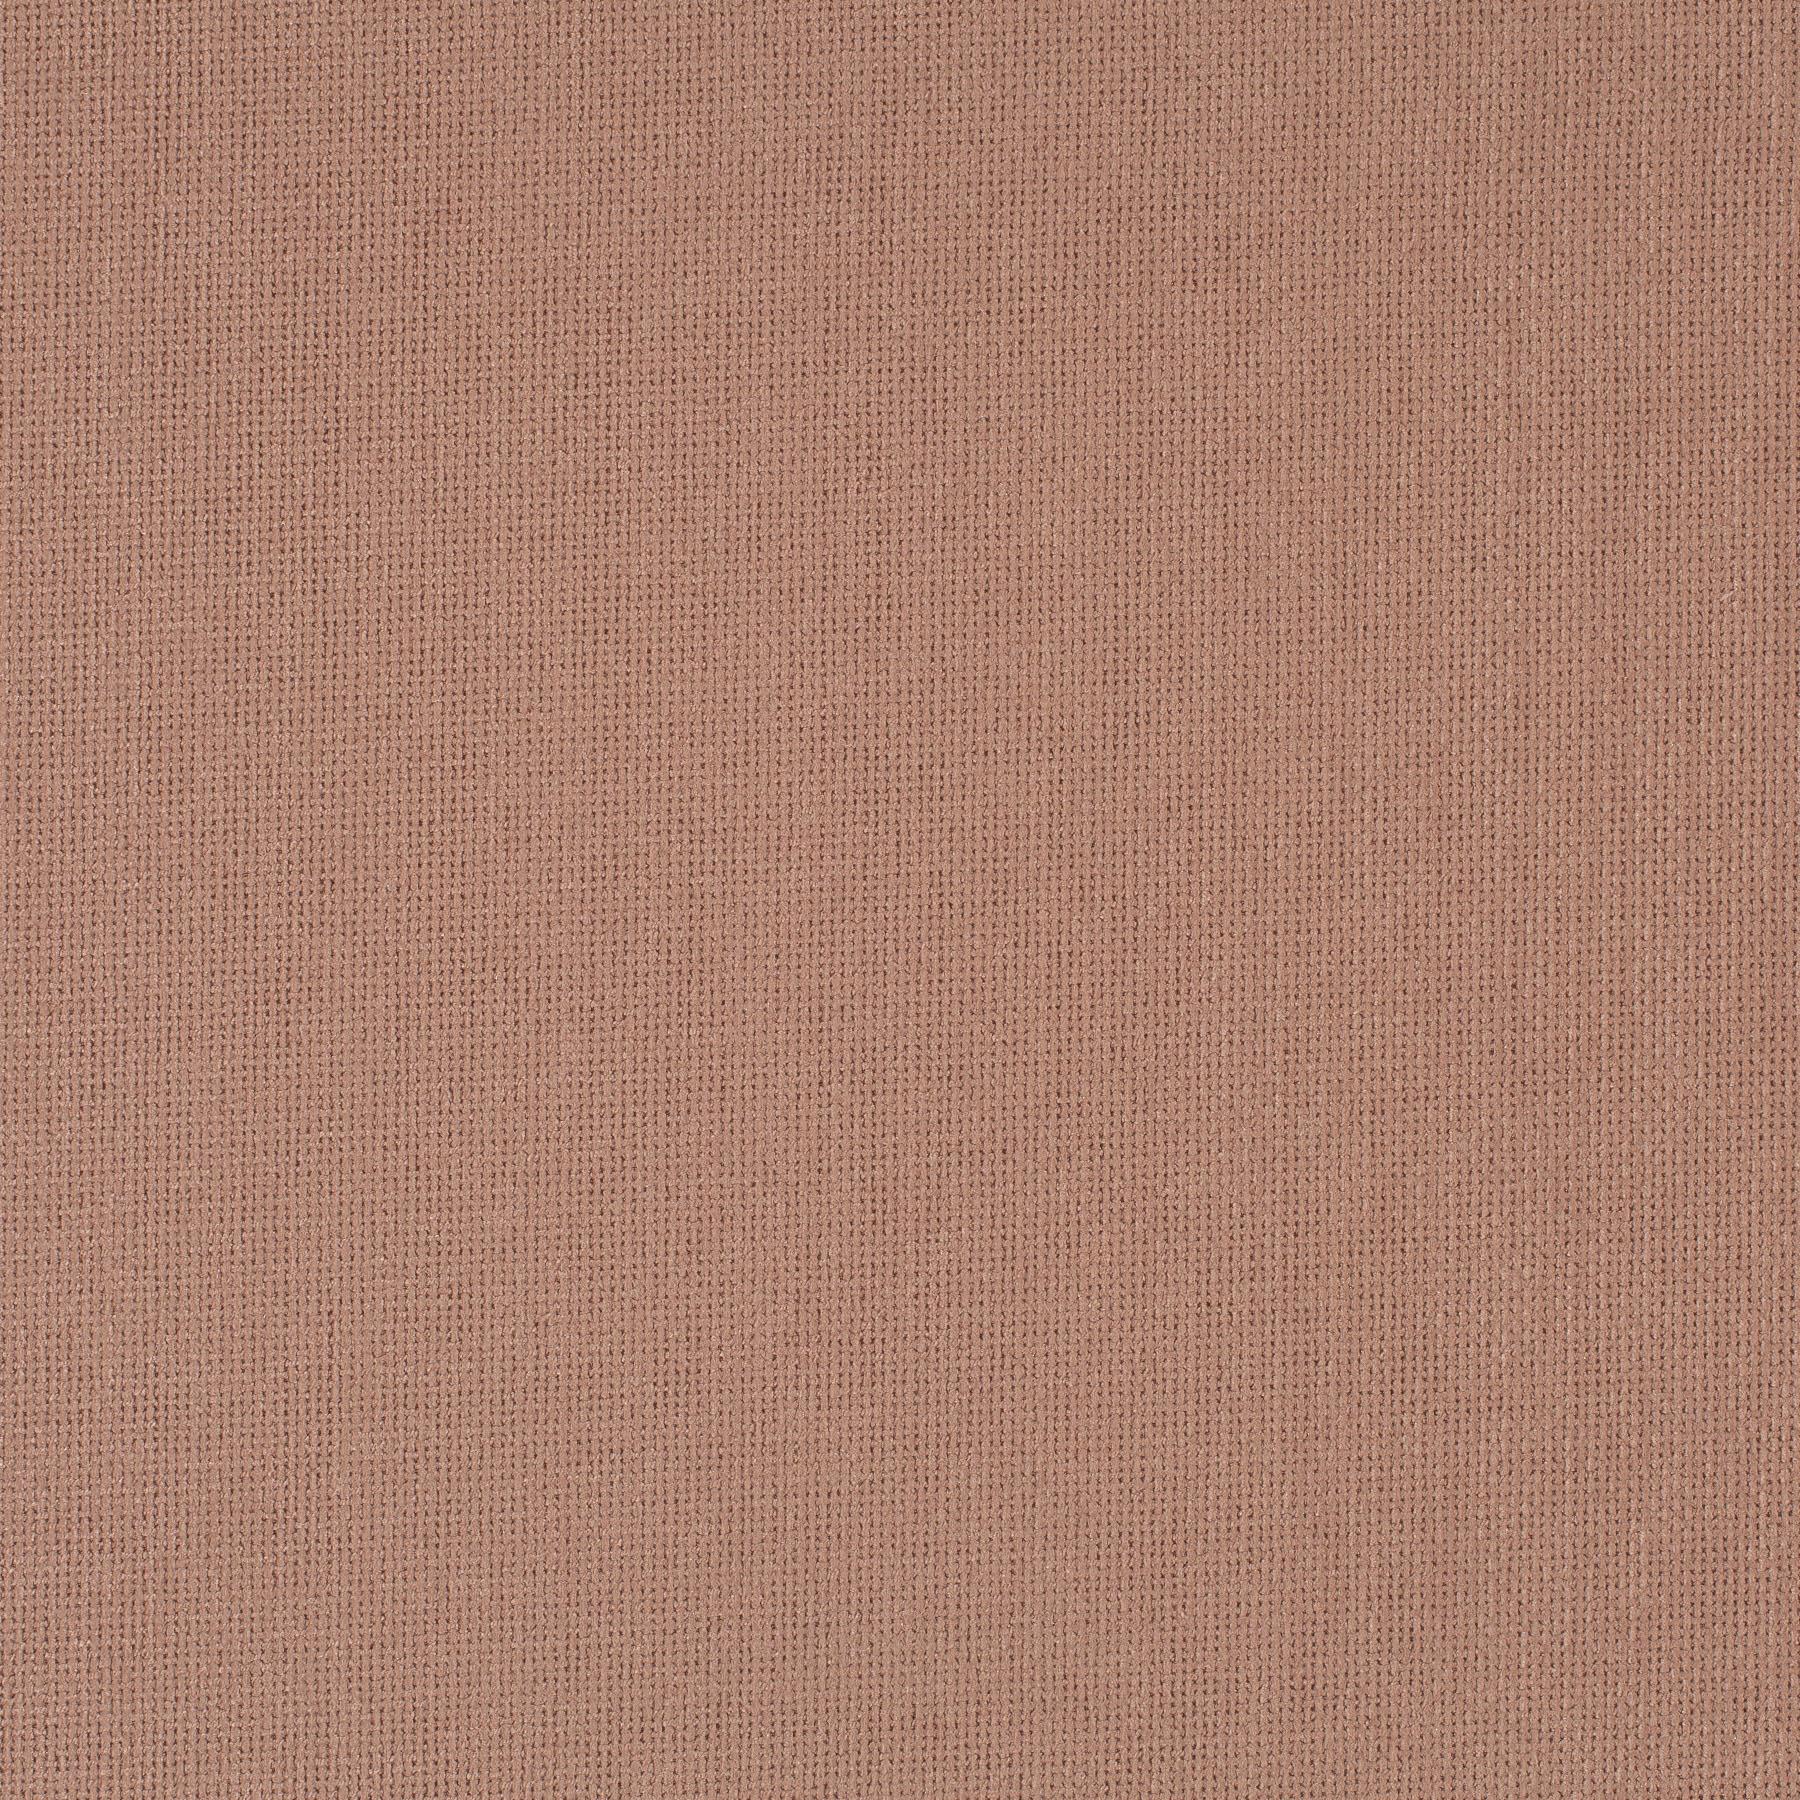 upholstery fabric toro vol 3 1 1243 079 jab anstoetz. Black Bedroom Furniture Sets. Home Design Ideas